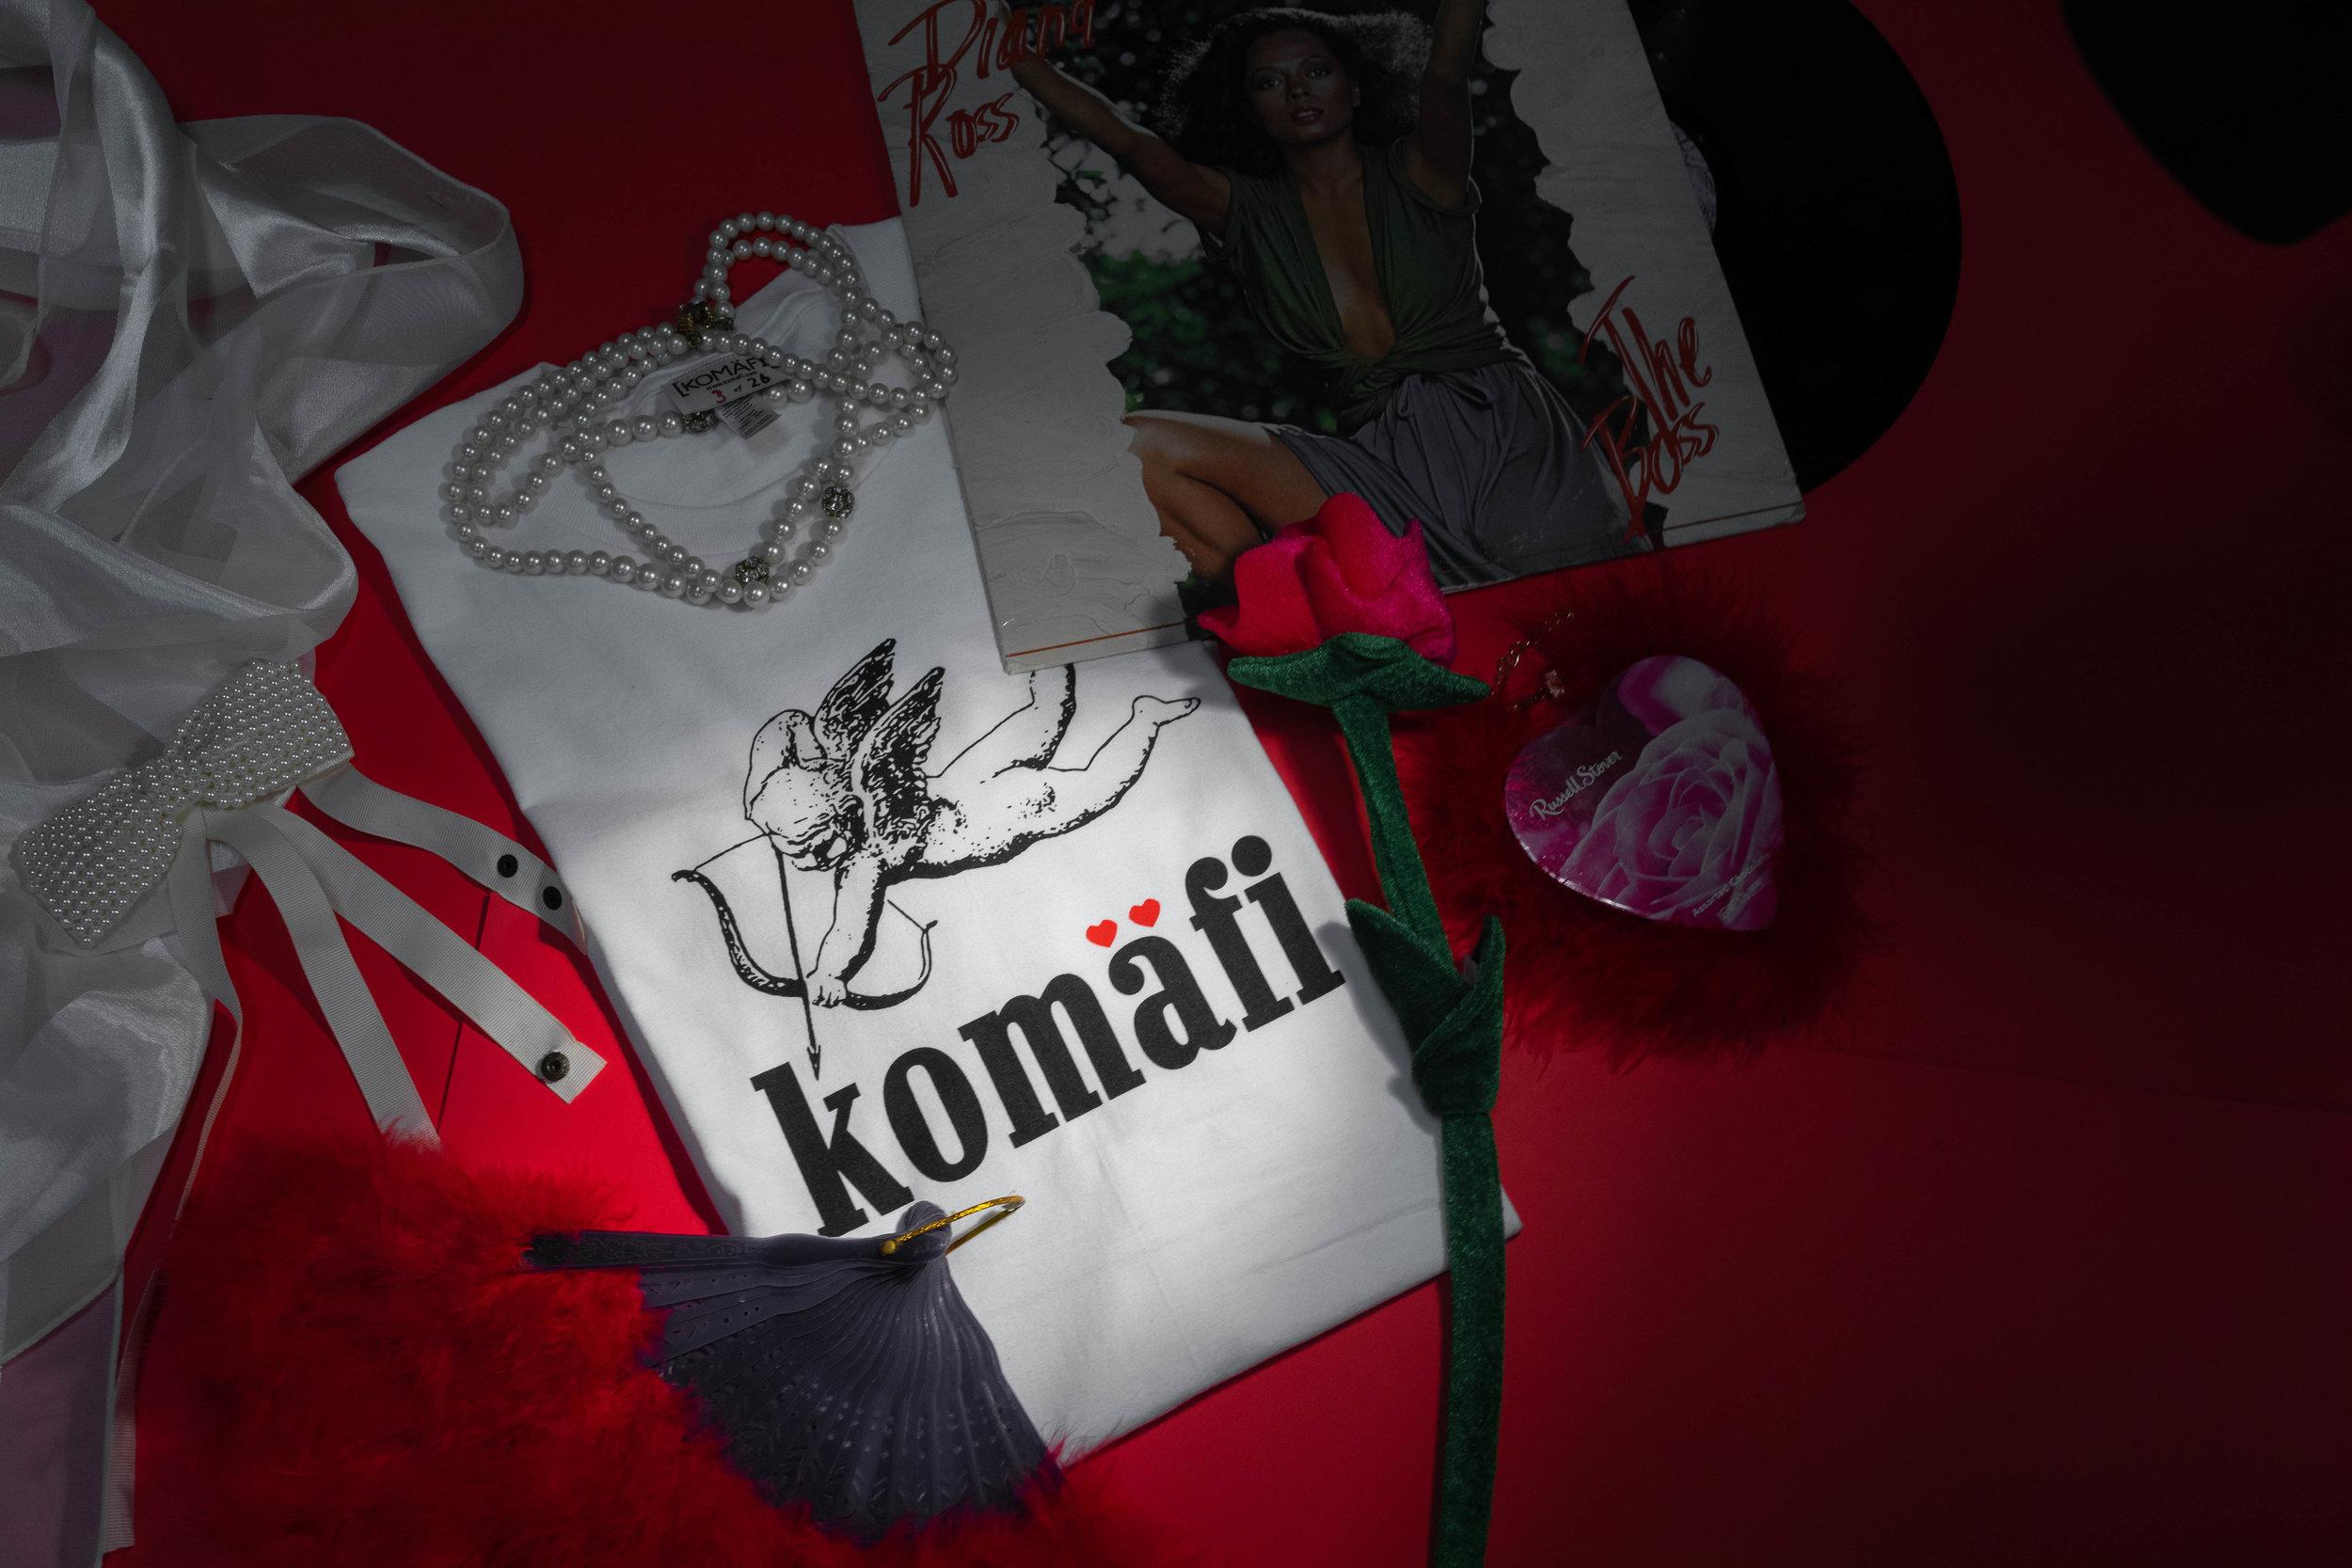 2019-02-12 Komafi (11 of 30).jpg